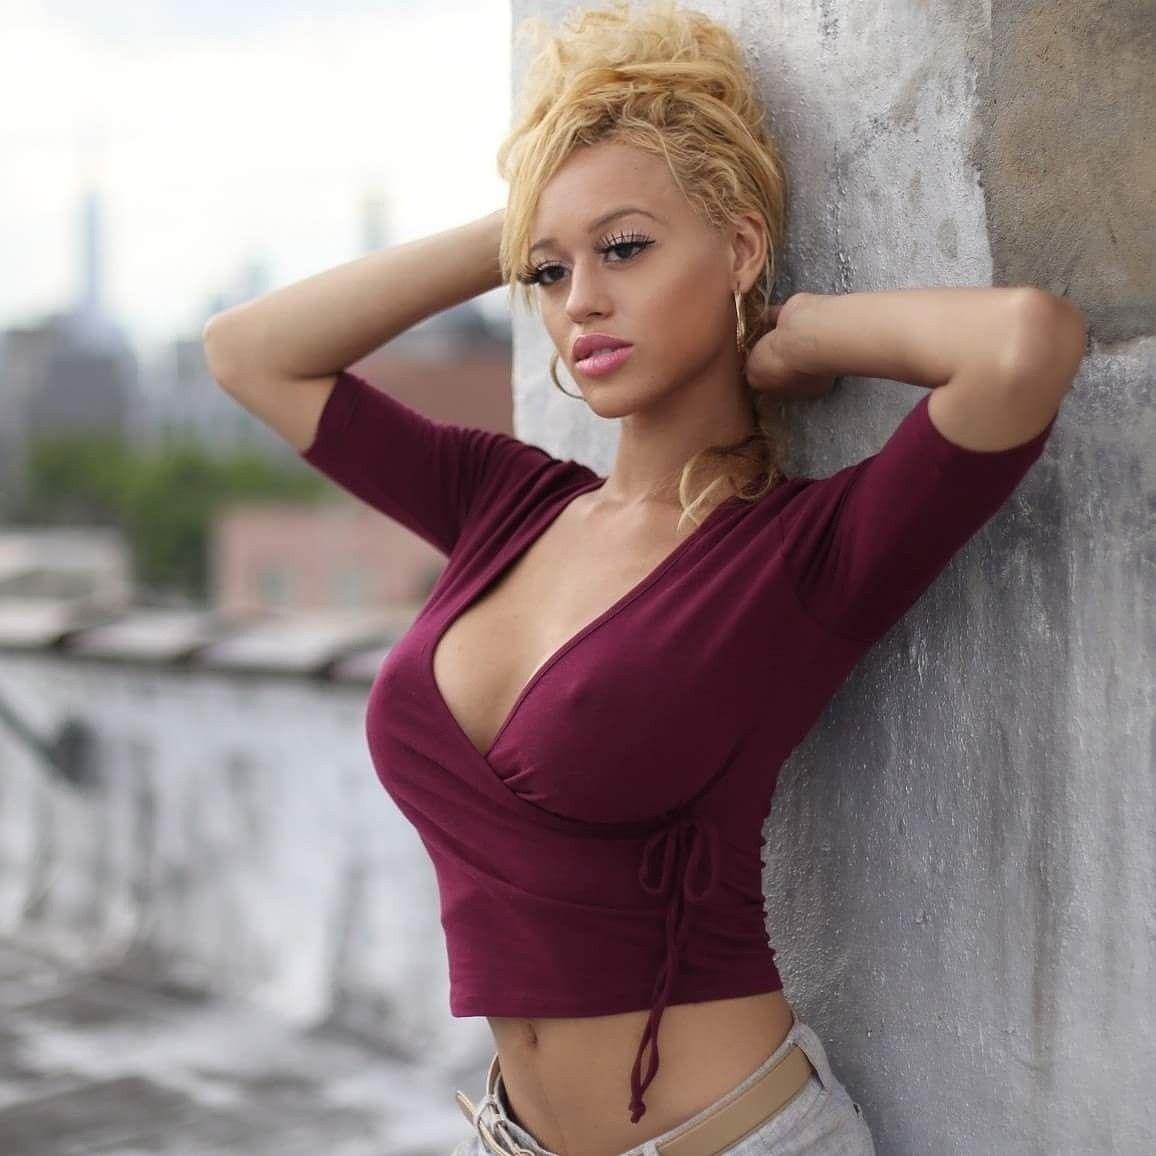 Selfie Stormi Maya Alvarado nude (46 foto and video), Topless, Bikini, Selfie, legs 2015